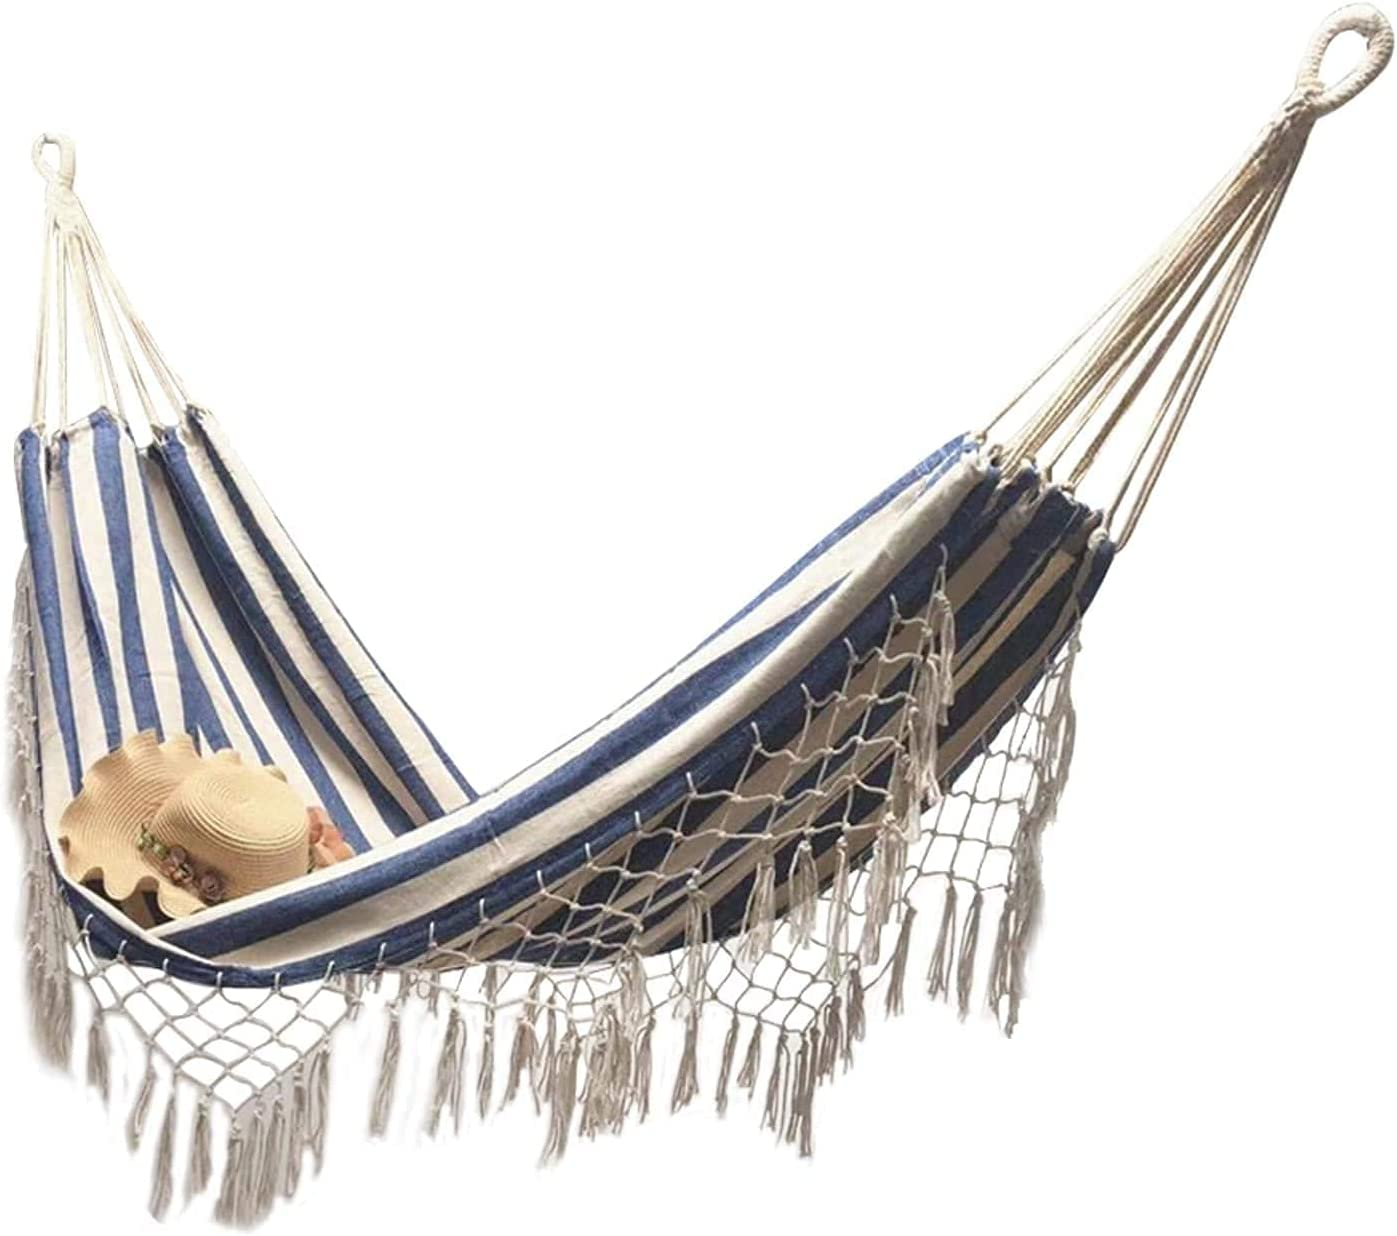 XIEZI Max 46% OFF Camping Hammock Genuine Outdoor H Bohemian